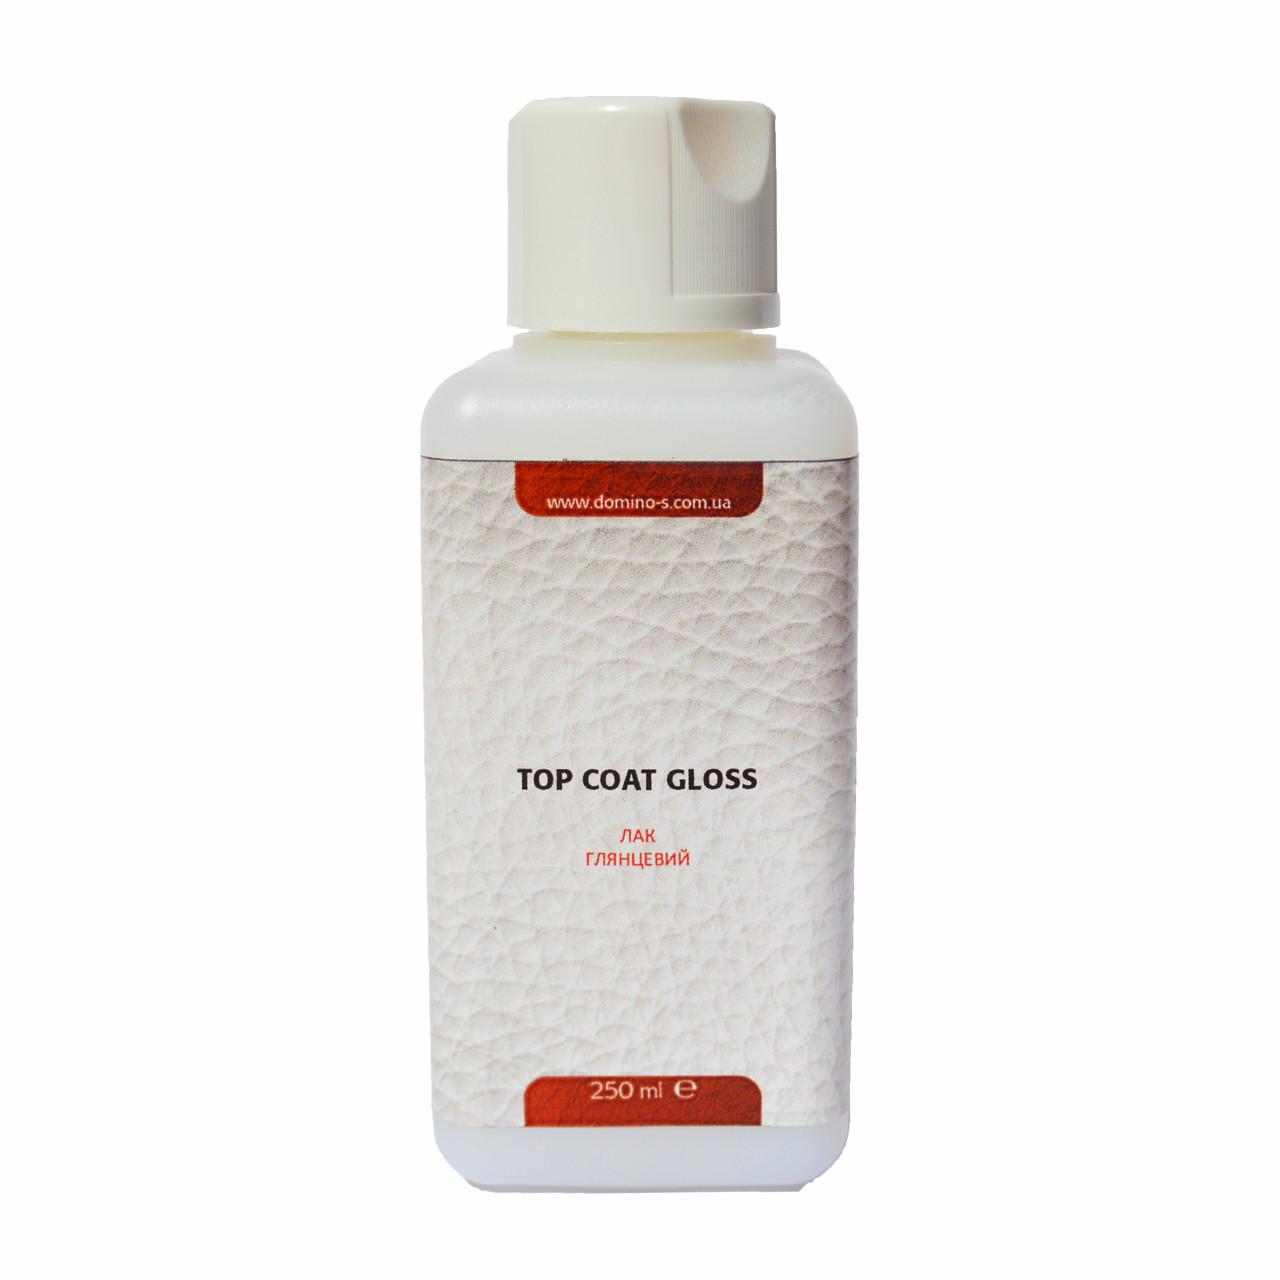 Лак для шкіри Top Coat Gloss, 250 мл